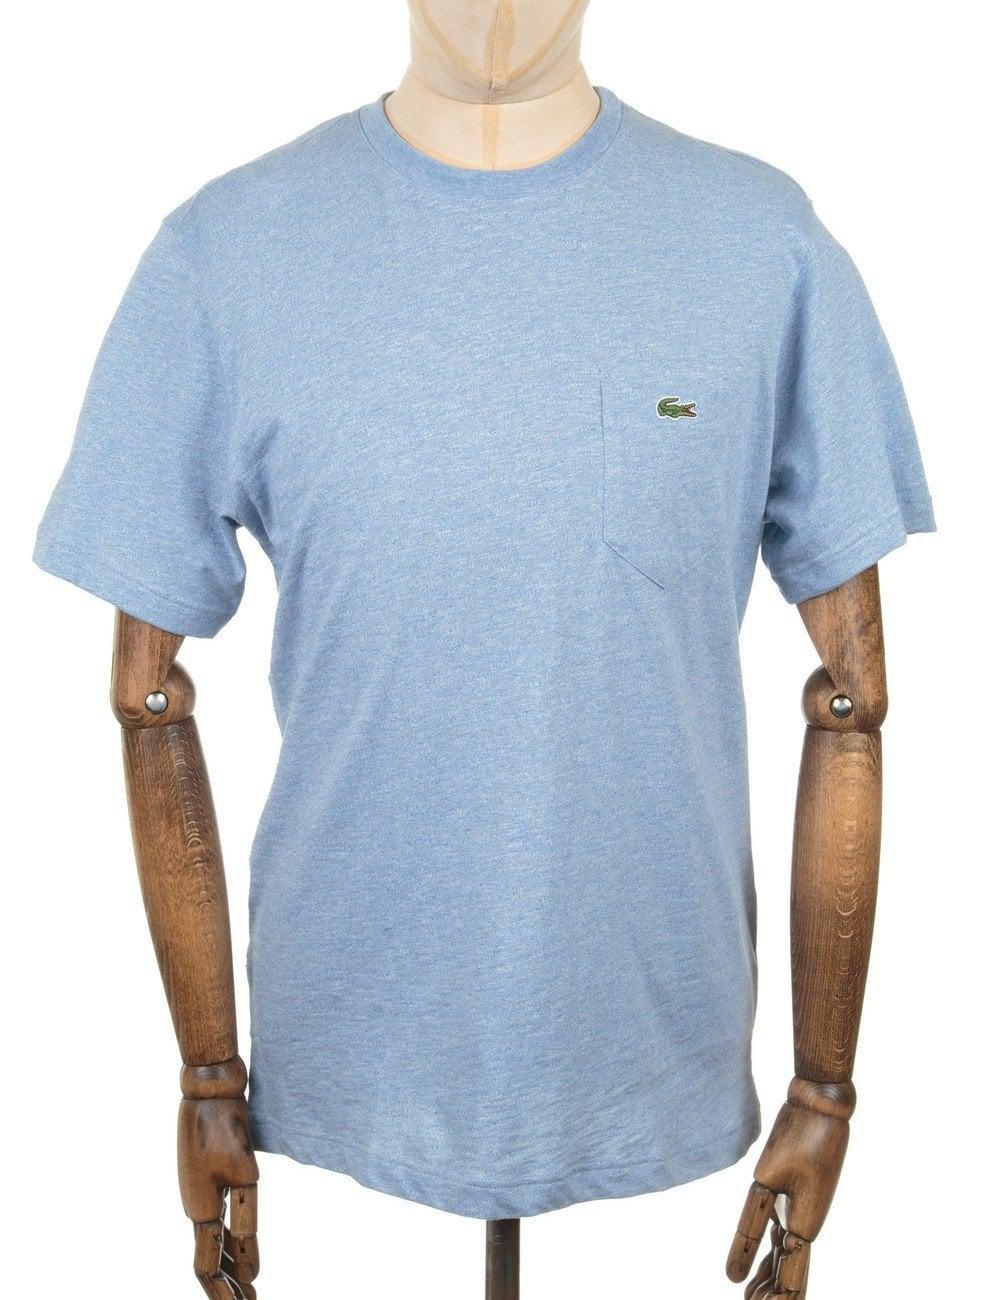 e61ac900c002e0 Lacoste Live S S Pocket Croc Logo T-shirt - Light Blue - Clothing ...